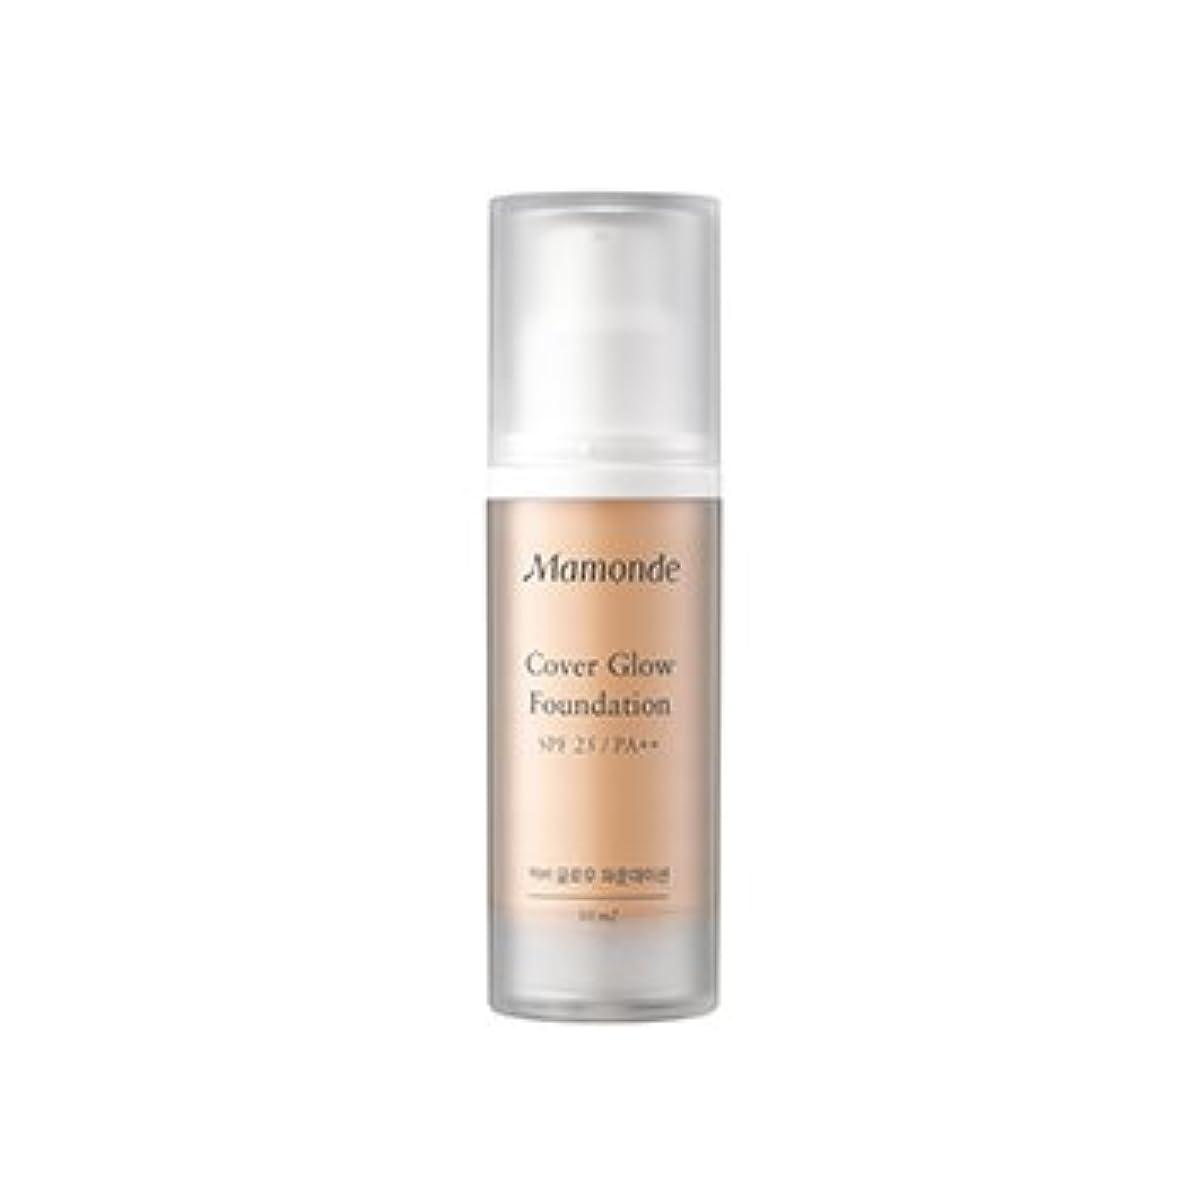 Mamonde Cover Glow Foundation 30ml/マモンド カバー グロウ ファンデーション 30ml (#17 Cool Beige) [並行輸入品]